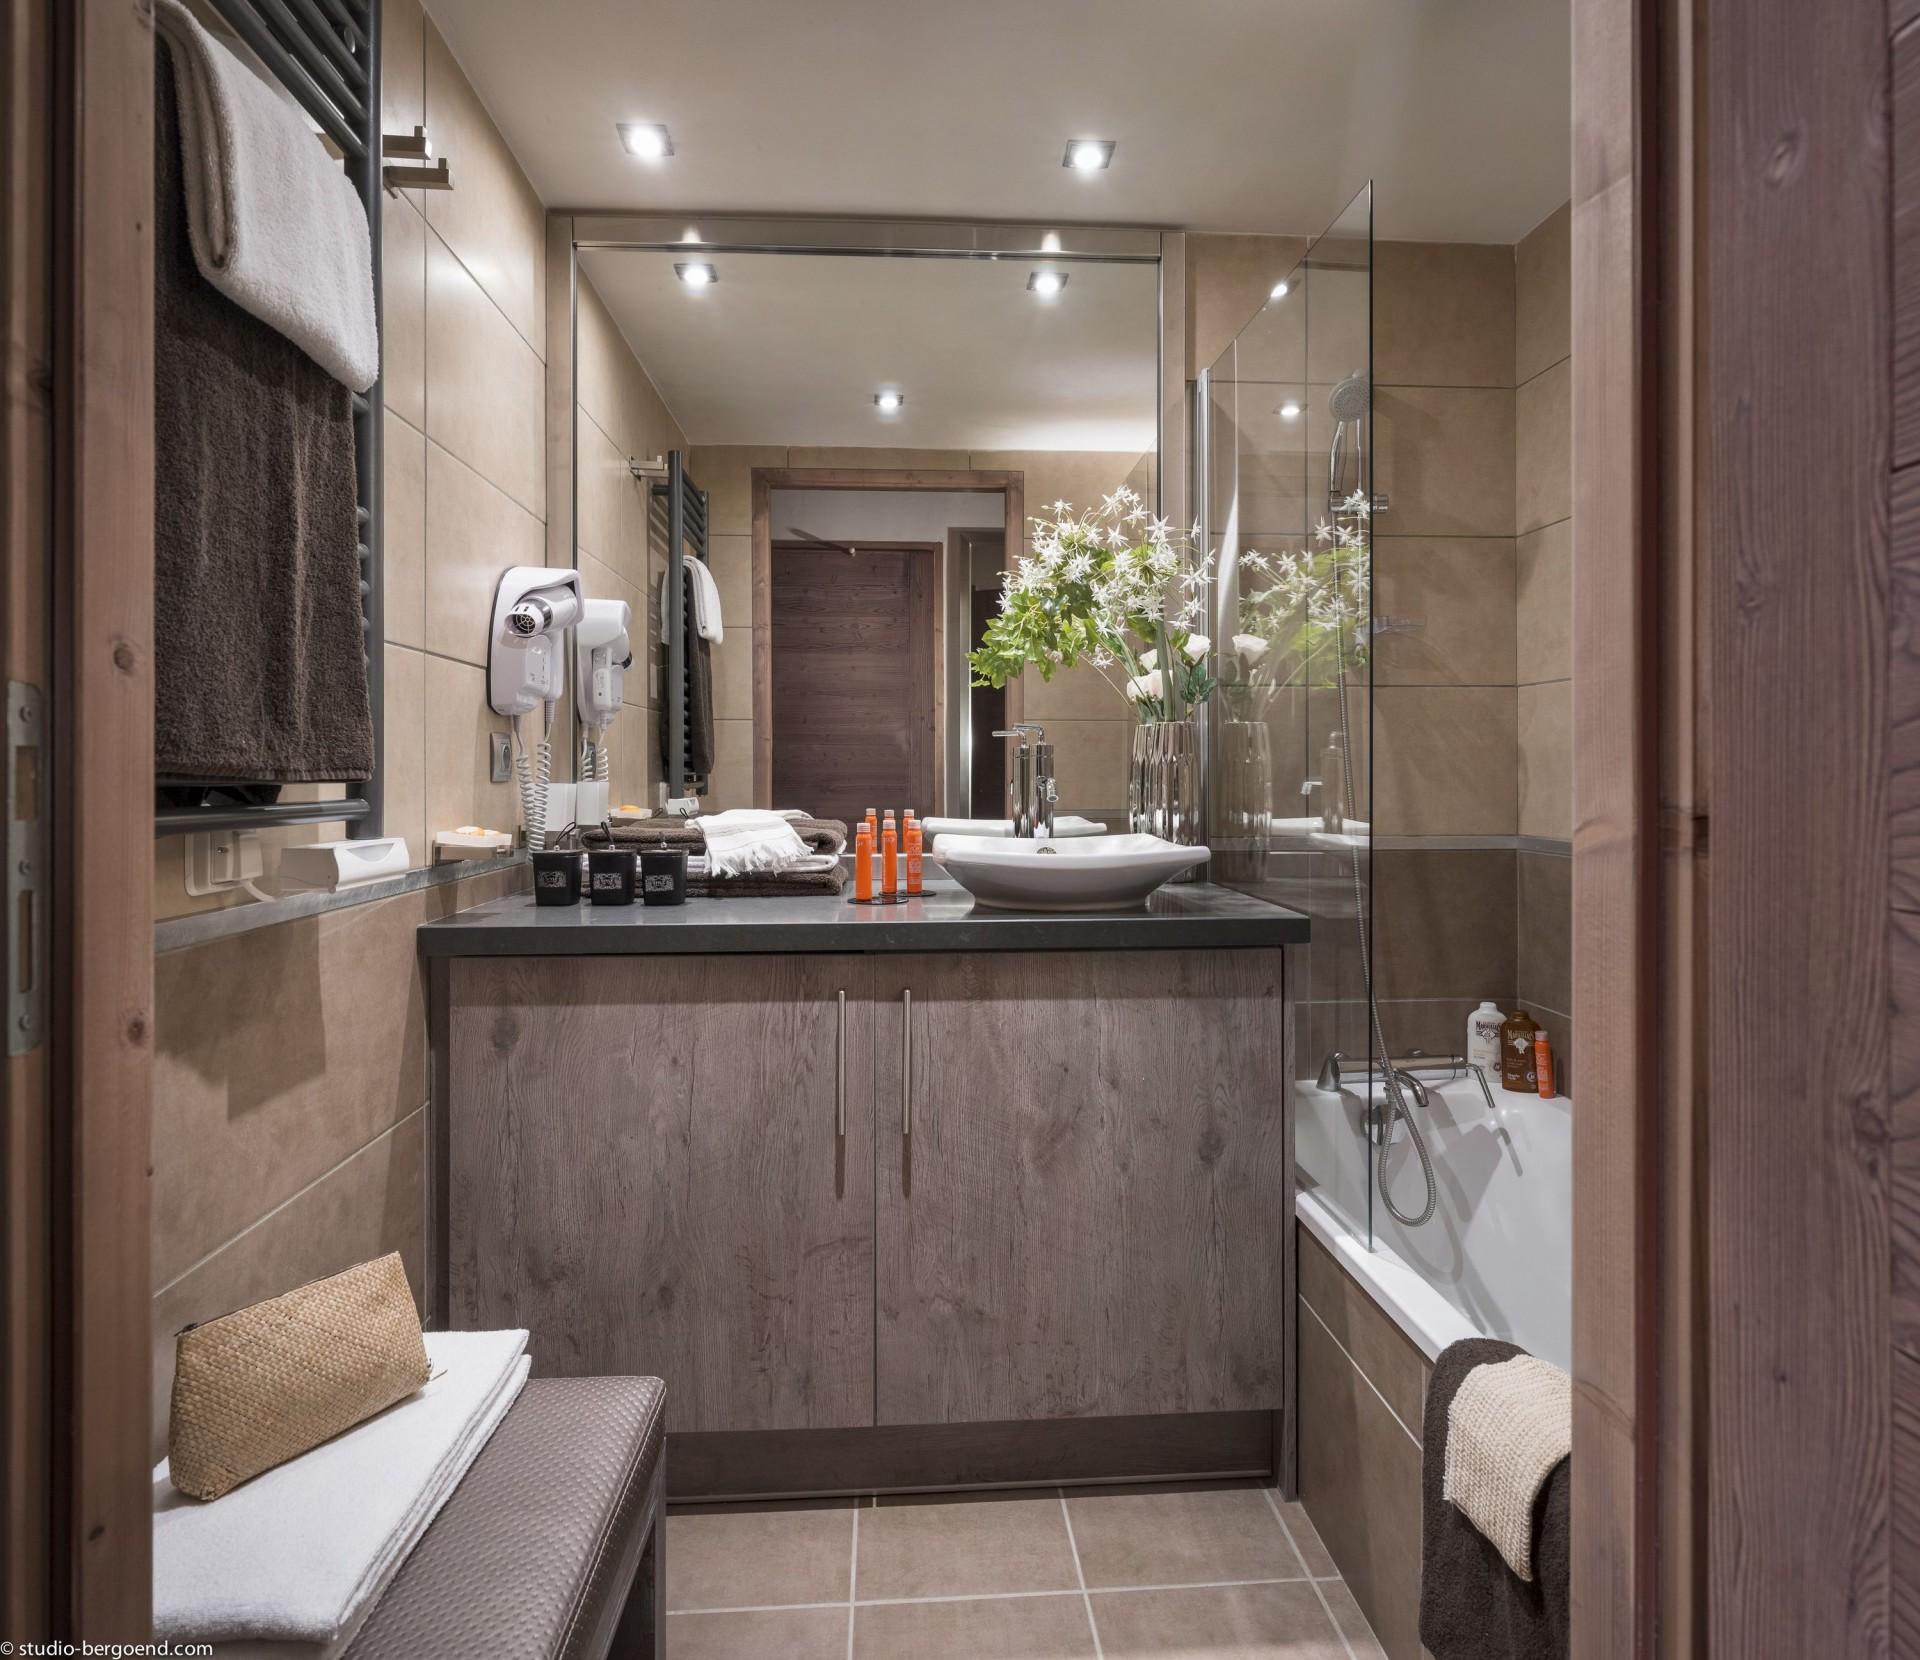 Flaine Rental Apartment Luxury Fangisse Bathroom